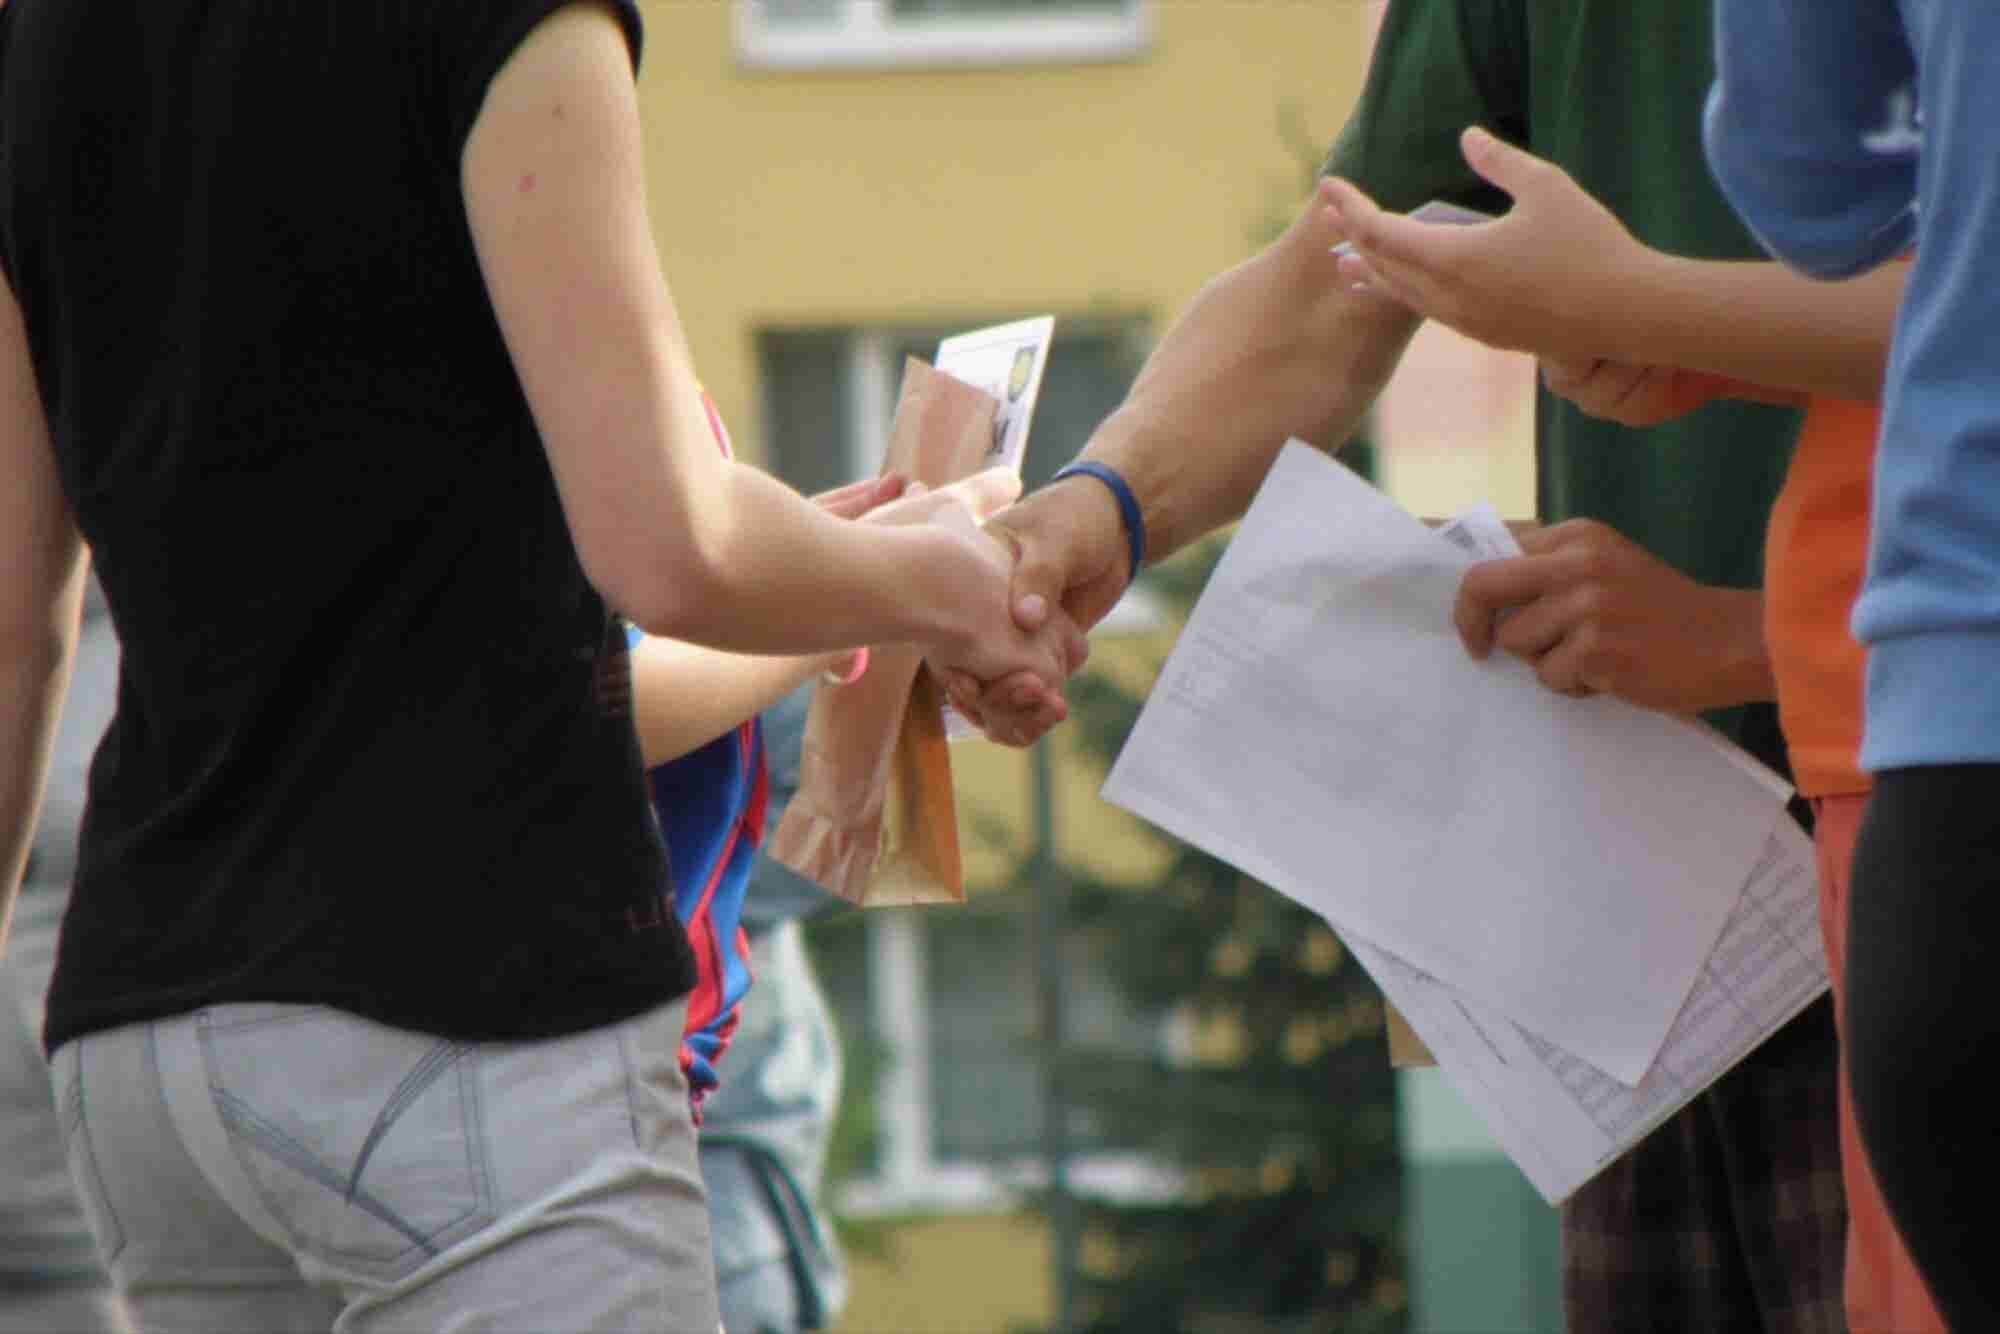 8 Handshakes That Make Unforgettably Bad First Impressions